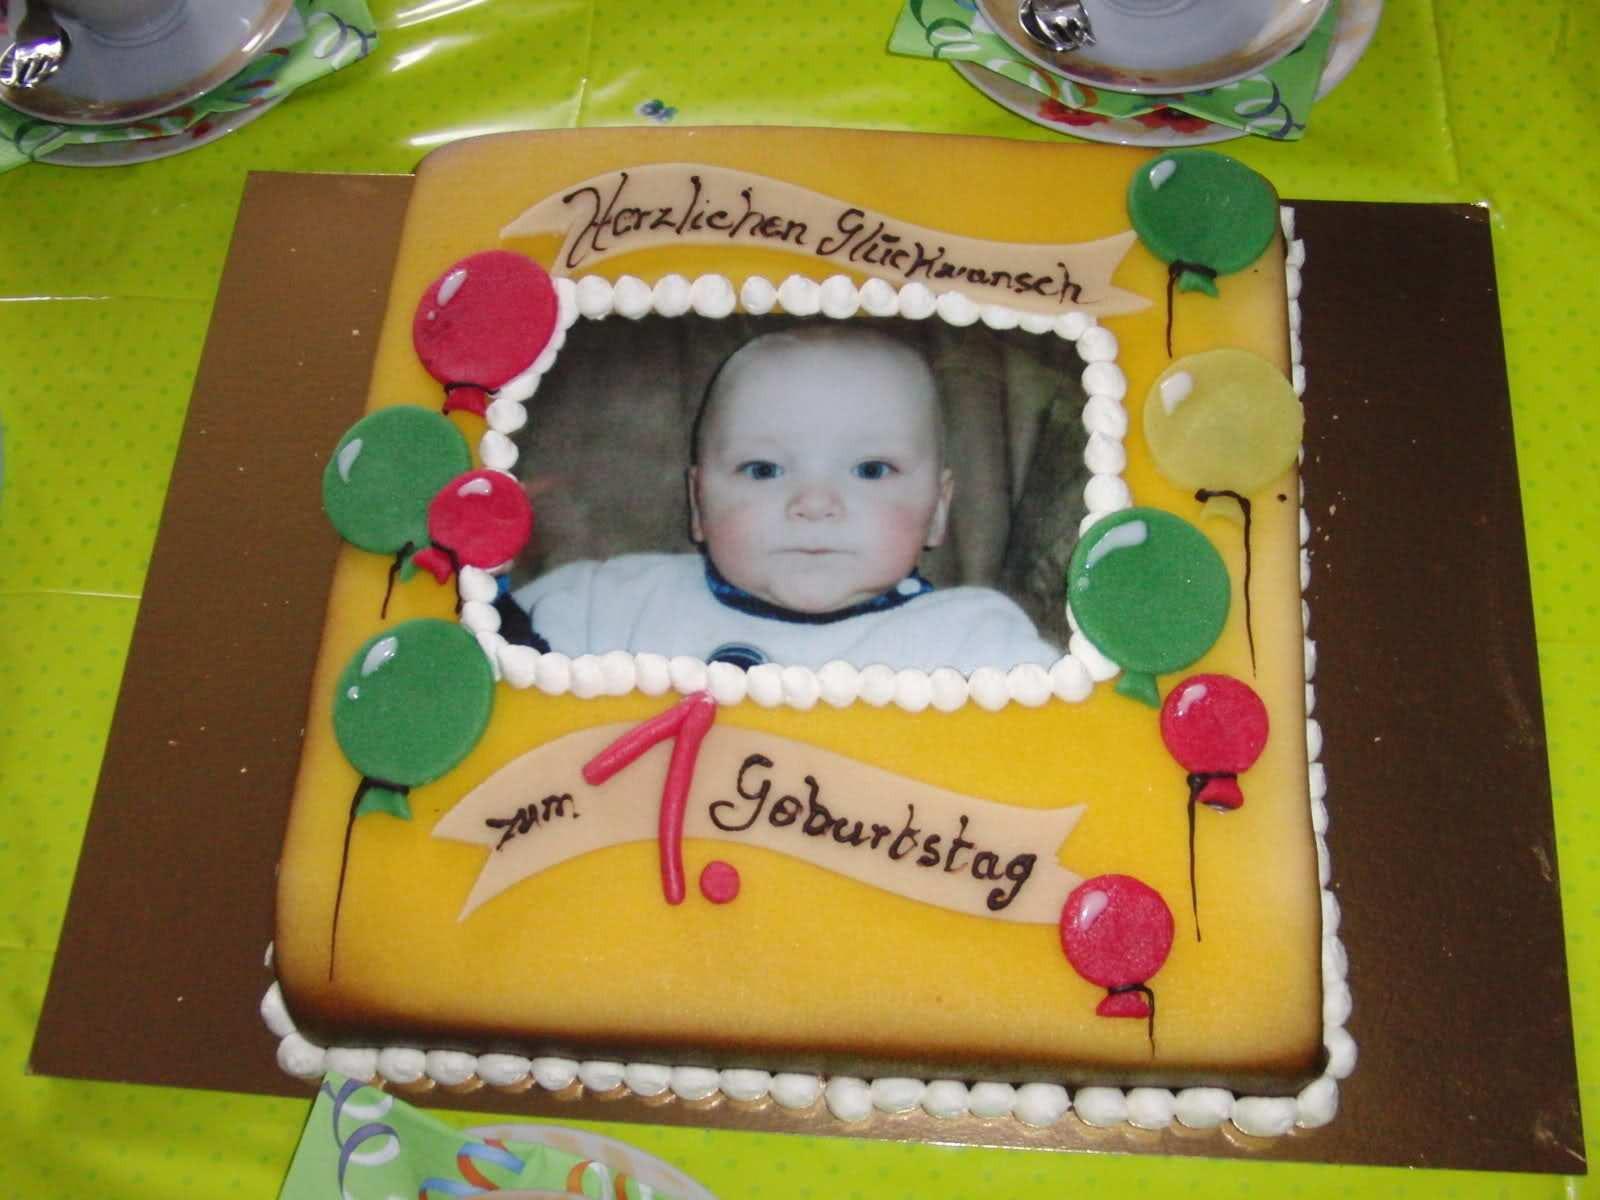 Geburtstagstorte 1 Jahr  Geburtstagstorte 1 Jahr Junge Geburtstagstorte